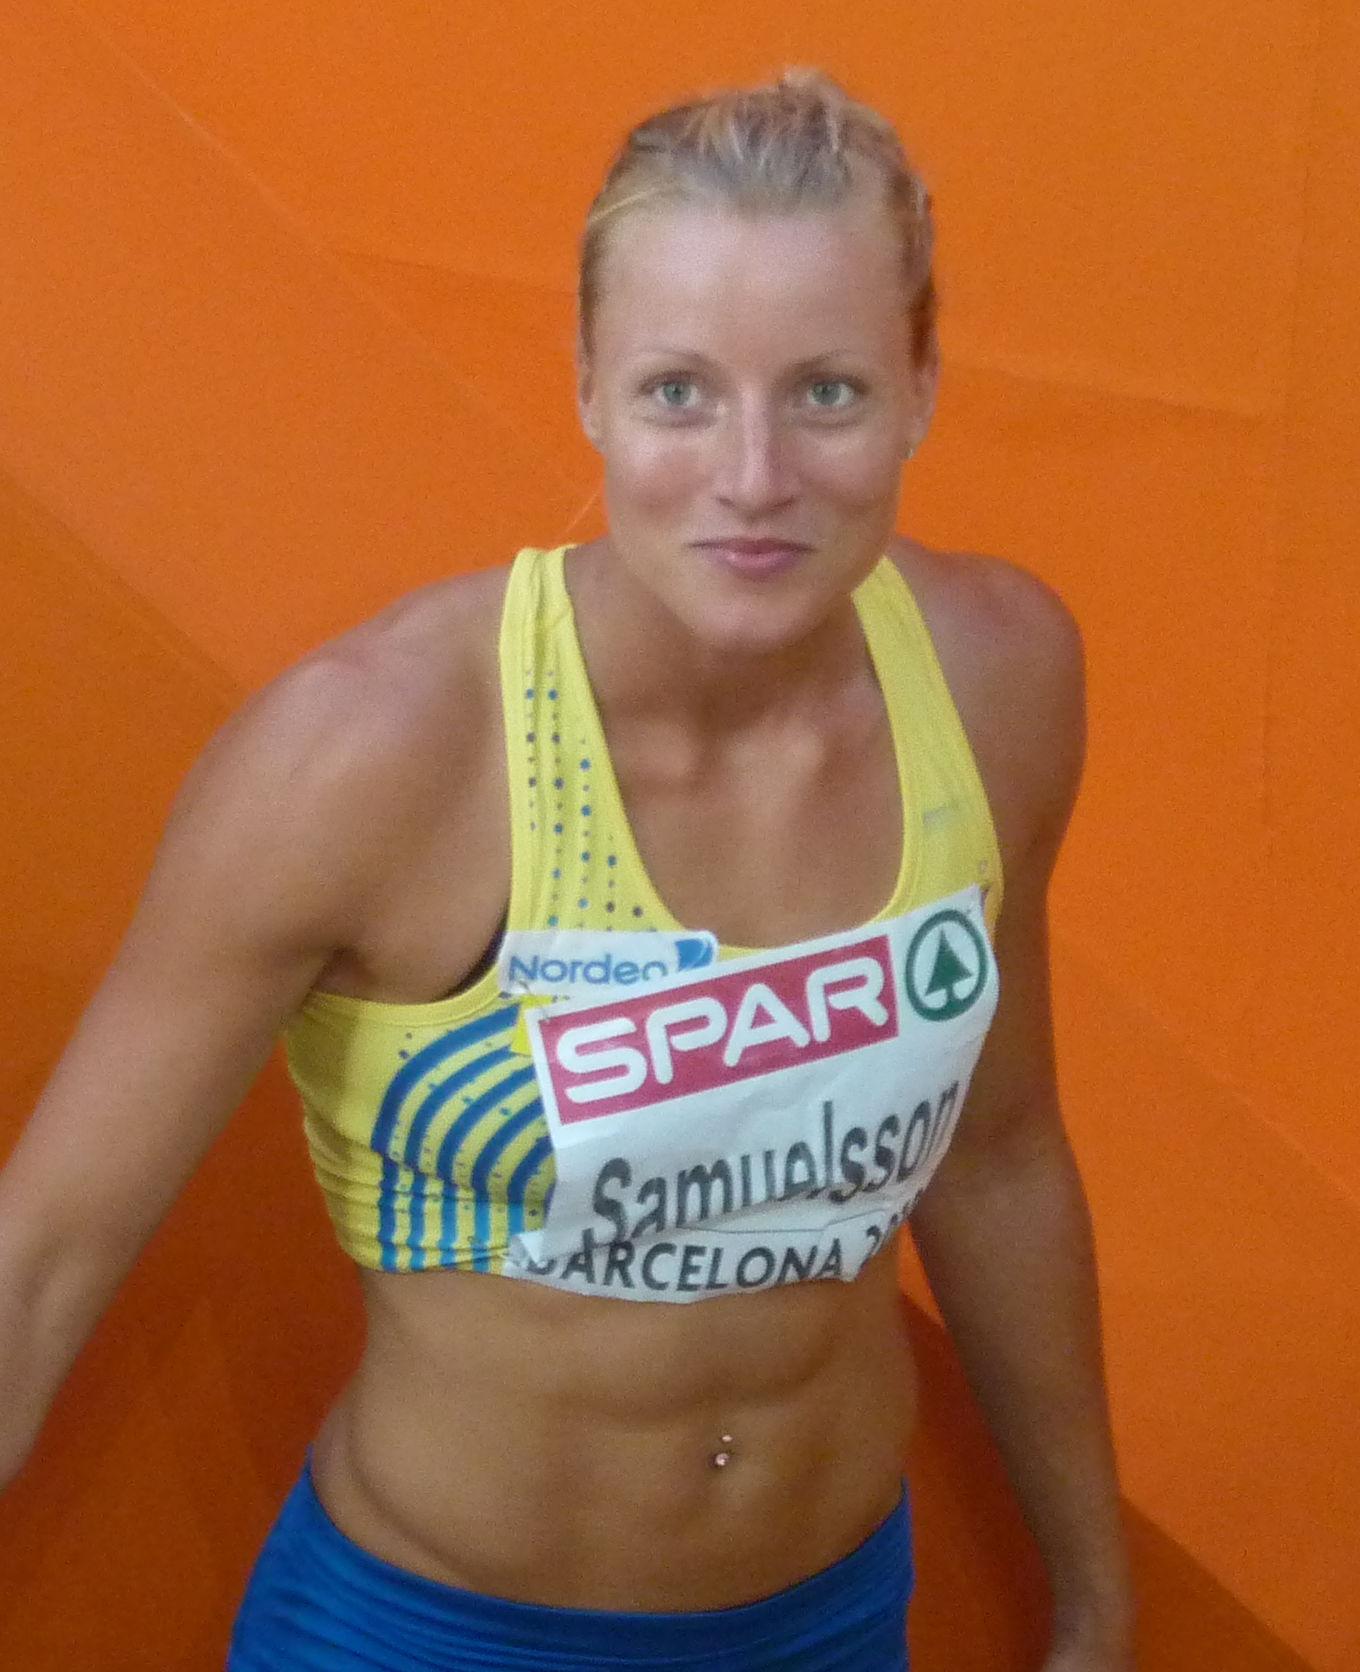 Photo of Jessica Samuelsson: Swedish heptathlete